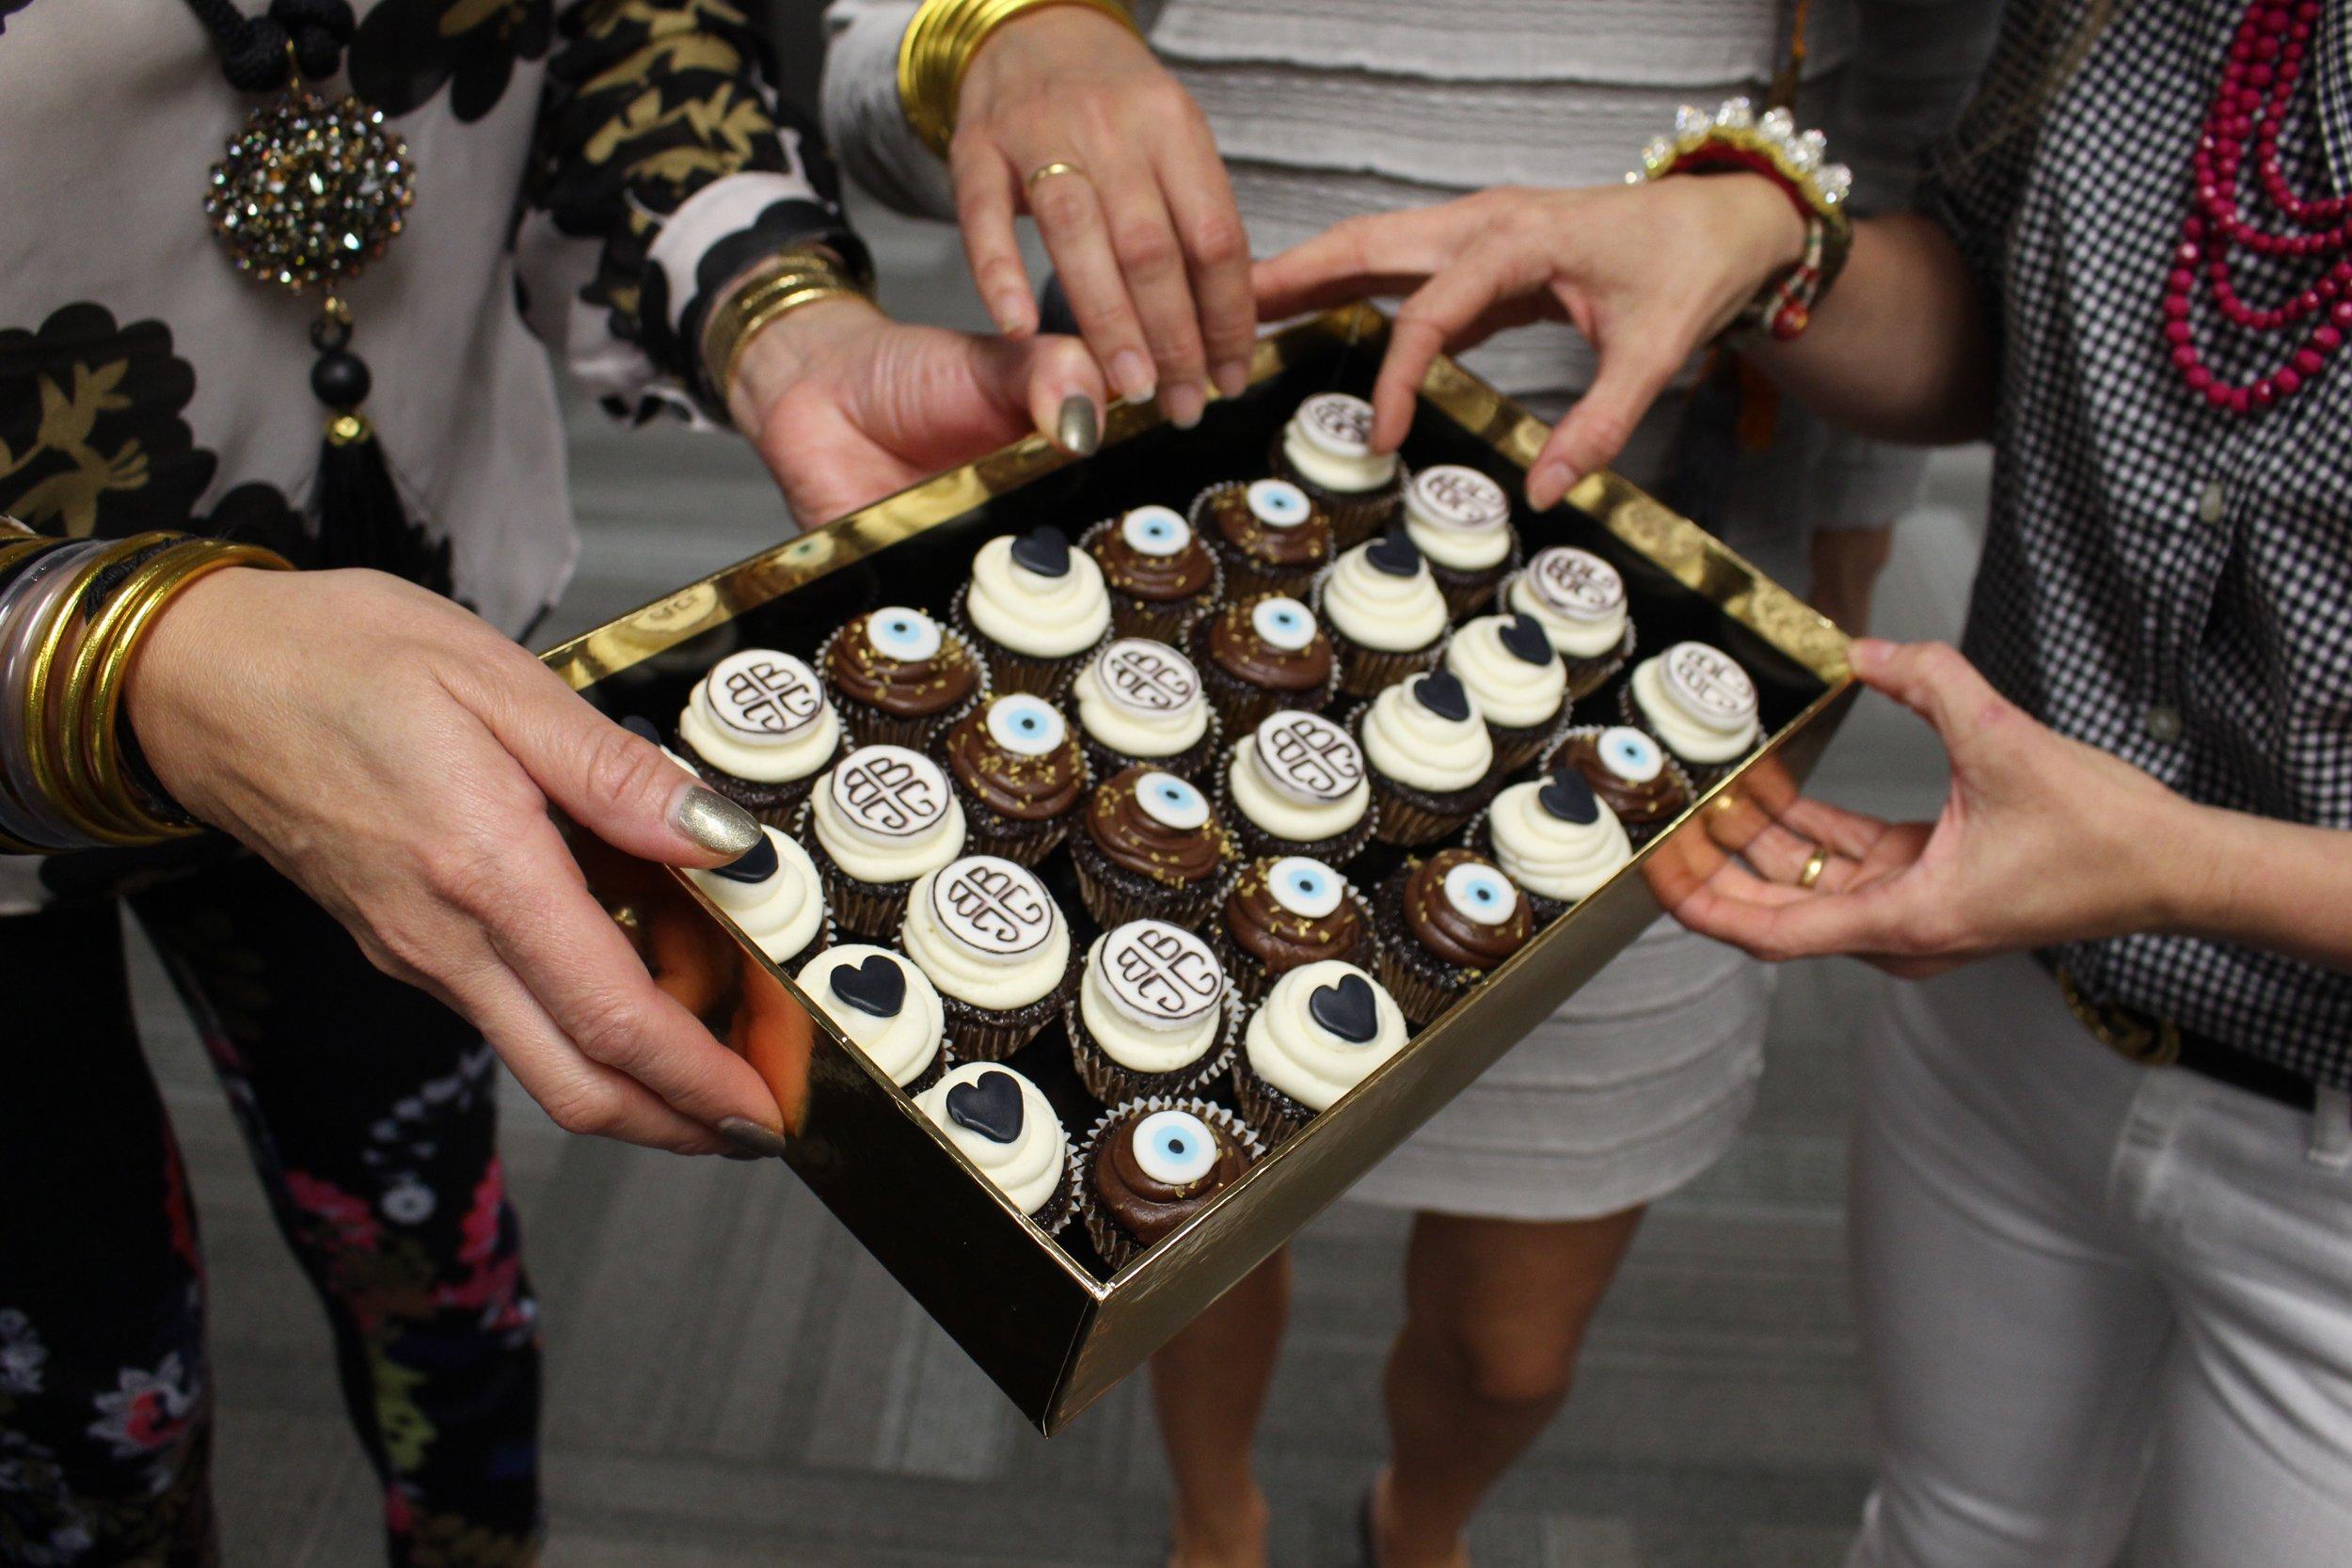 BuDhaGirls love mini cupcakes by Paola!